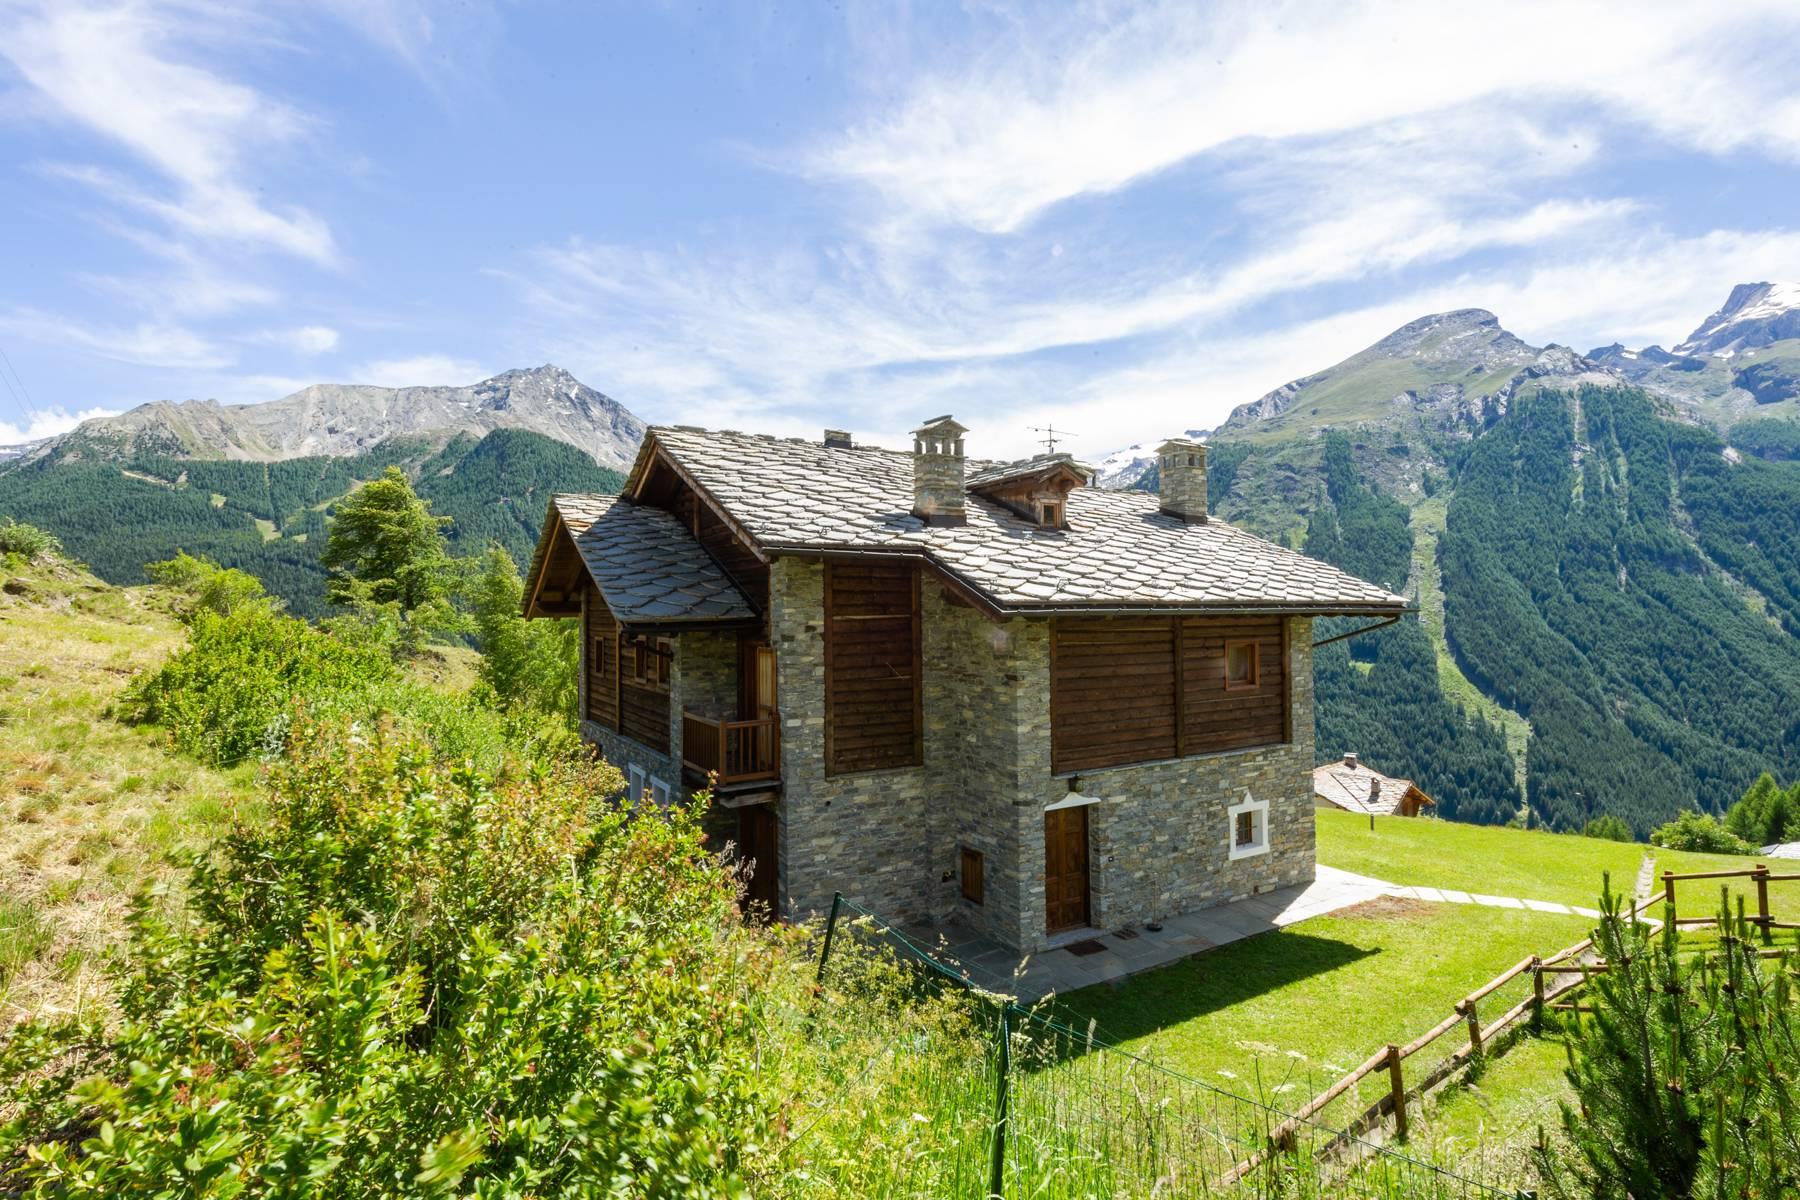 Villa in Vendita a Cogne: 5 locali, 377 mq - Foto 16